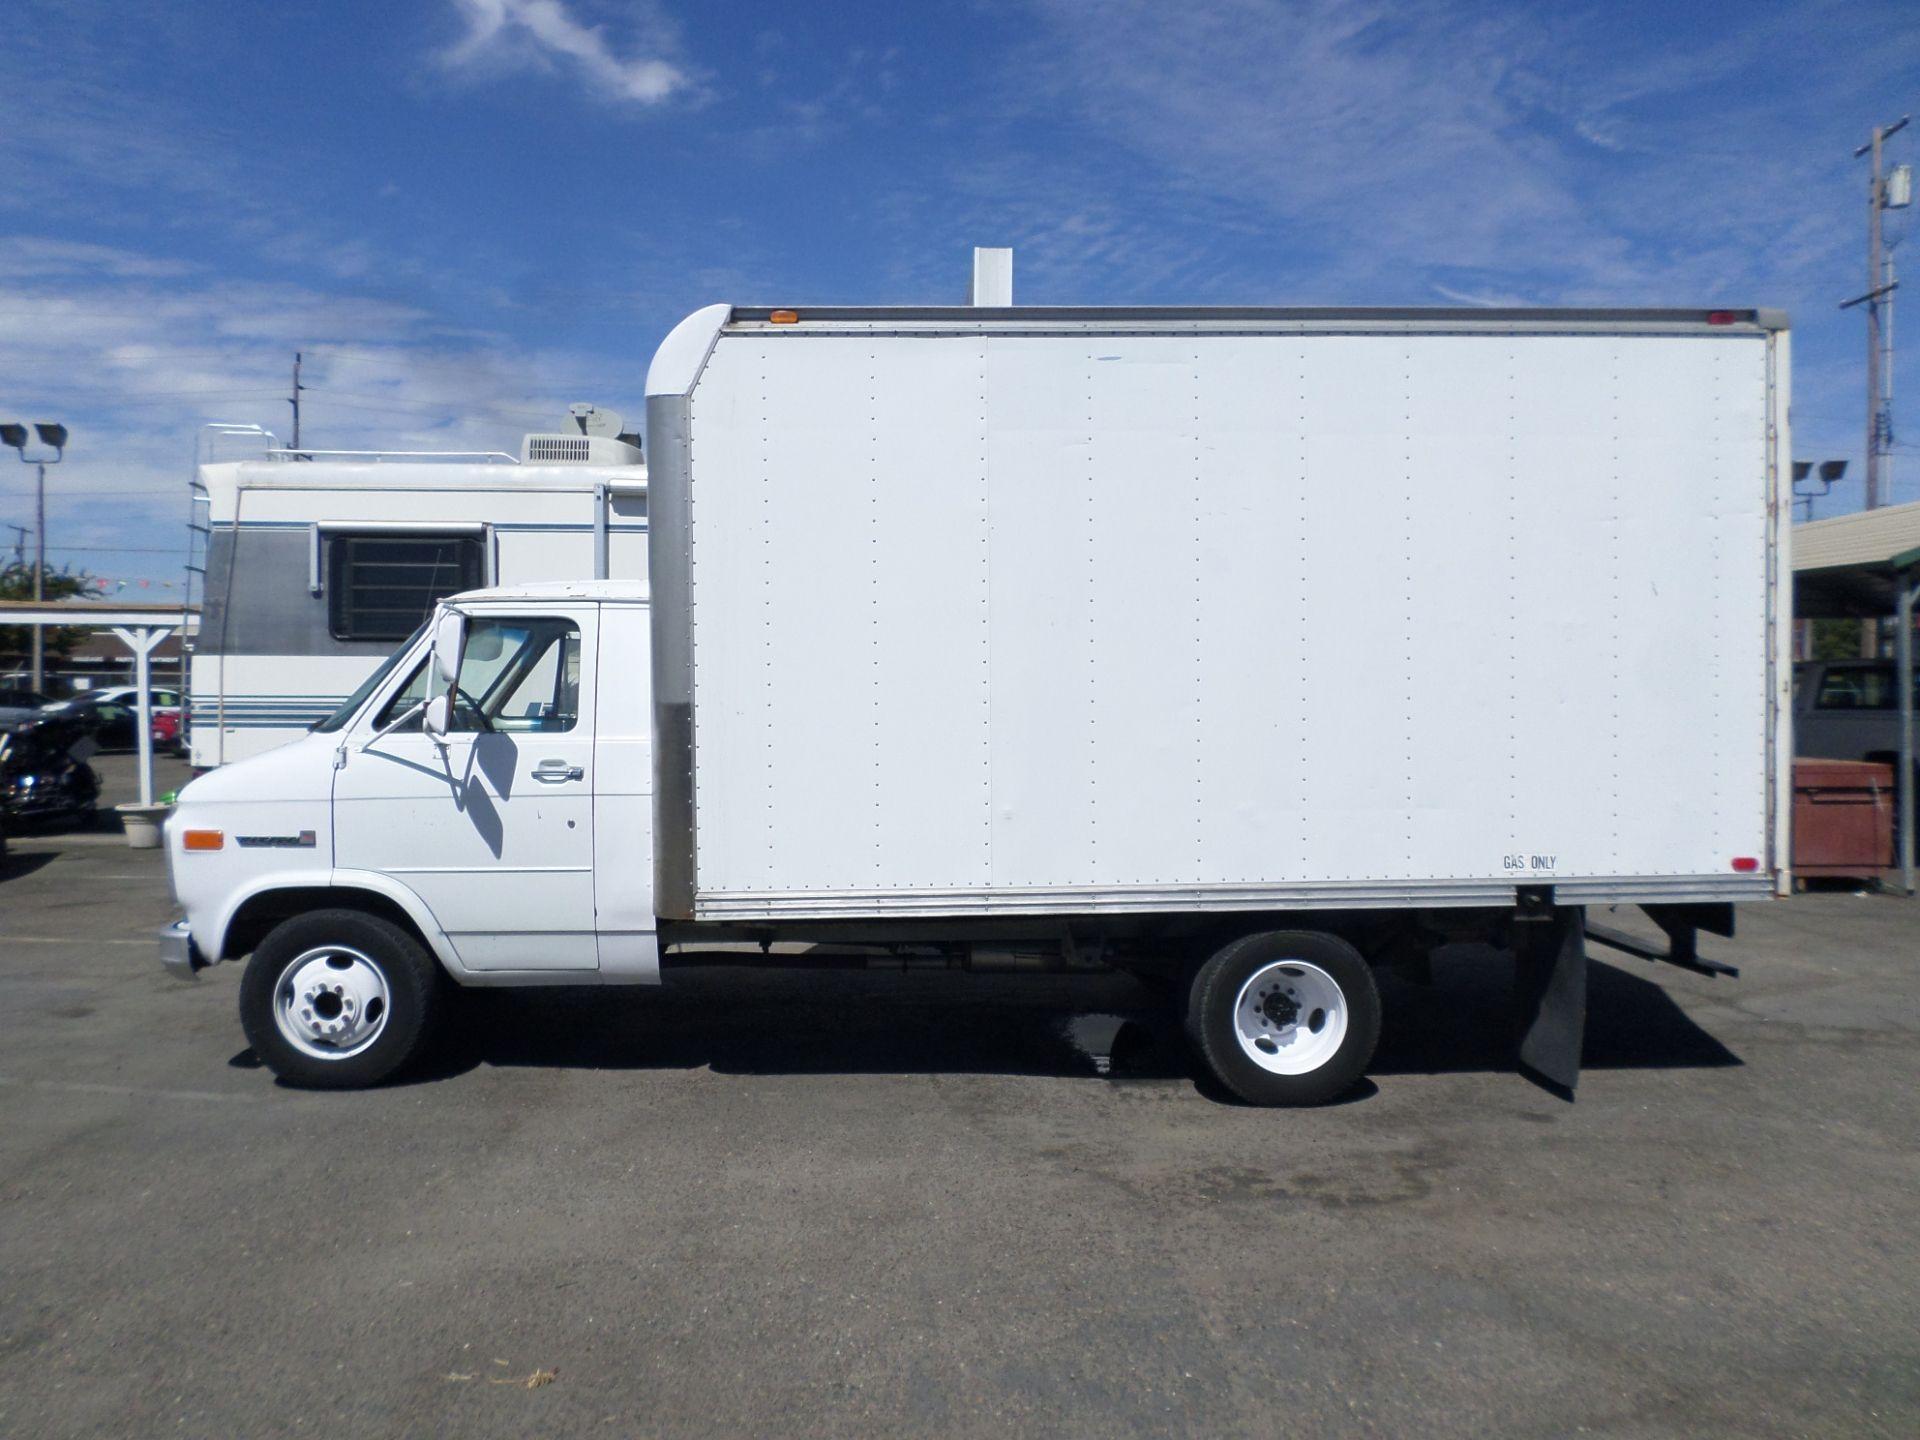 Commercial Equipment For Sale 1986 Gmc Vandura Box Van In Lodi Stockton Ca Box Van Chevrolet Van Gmc